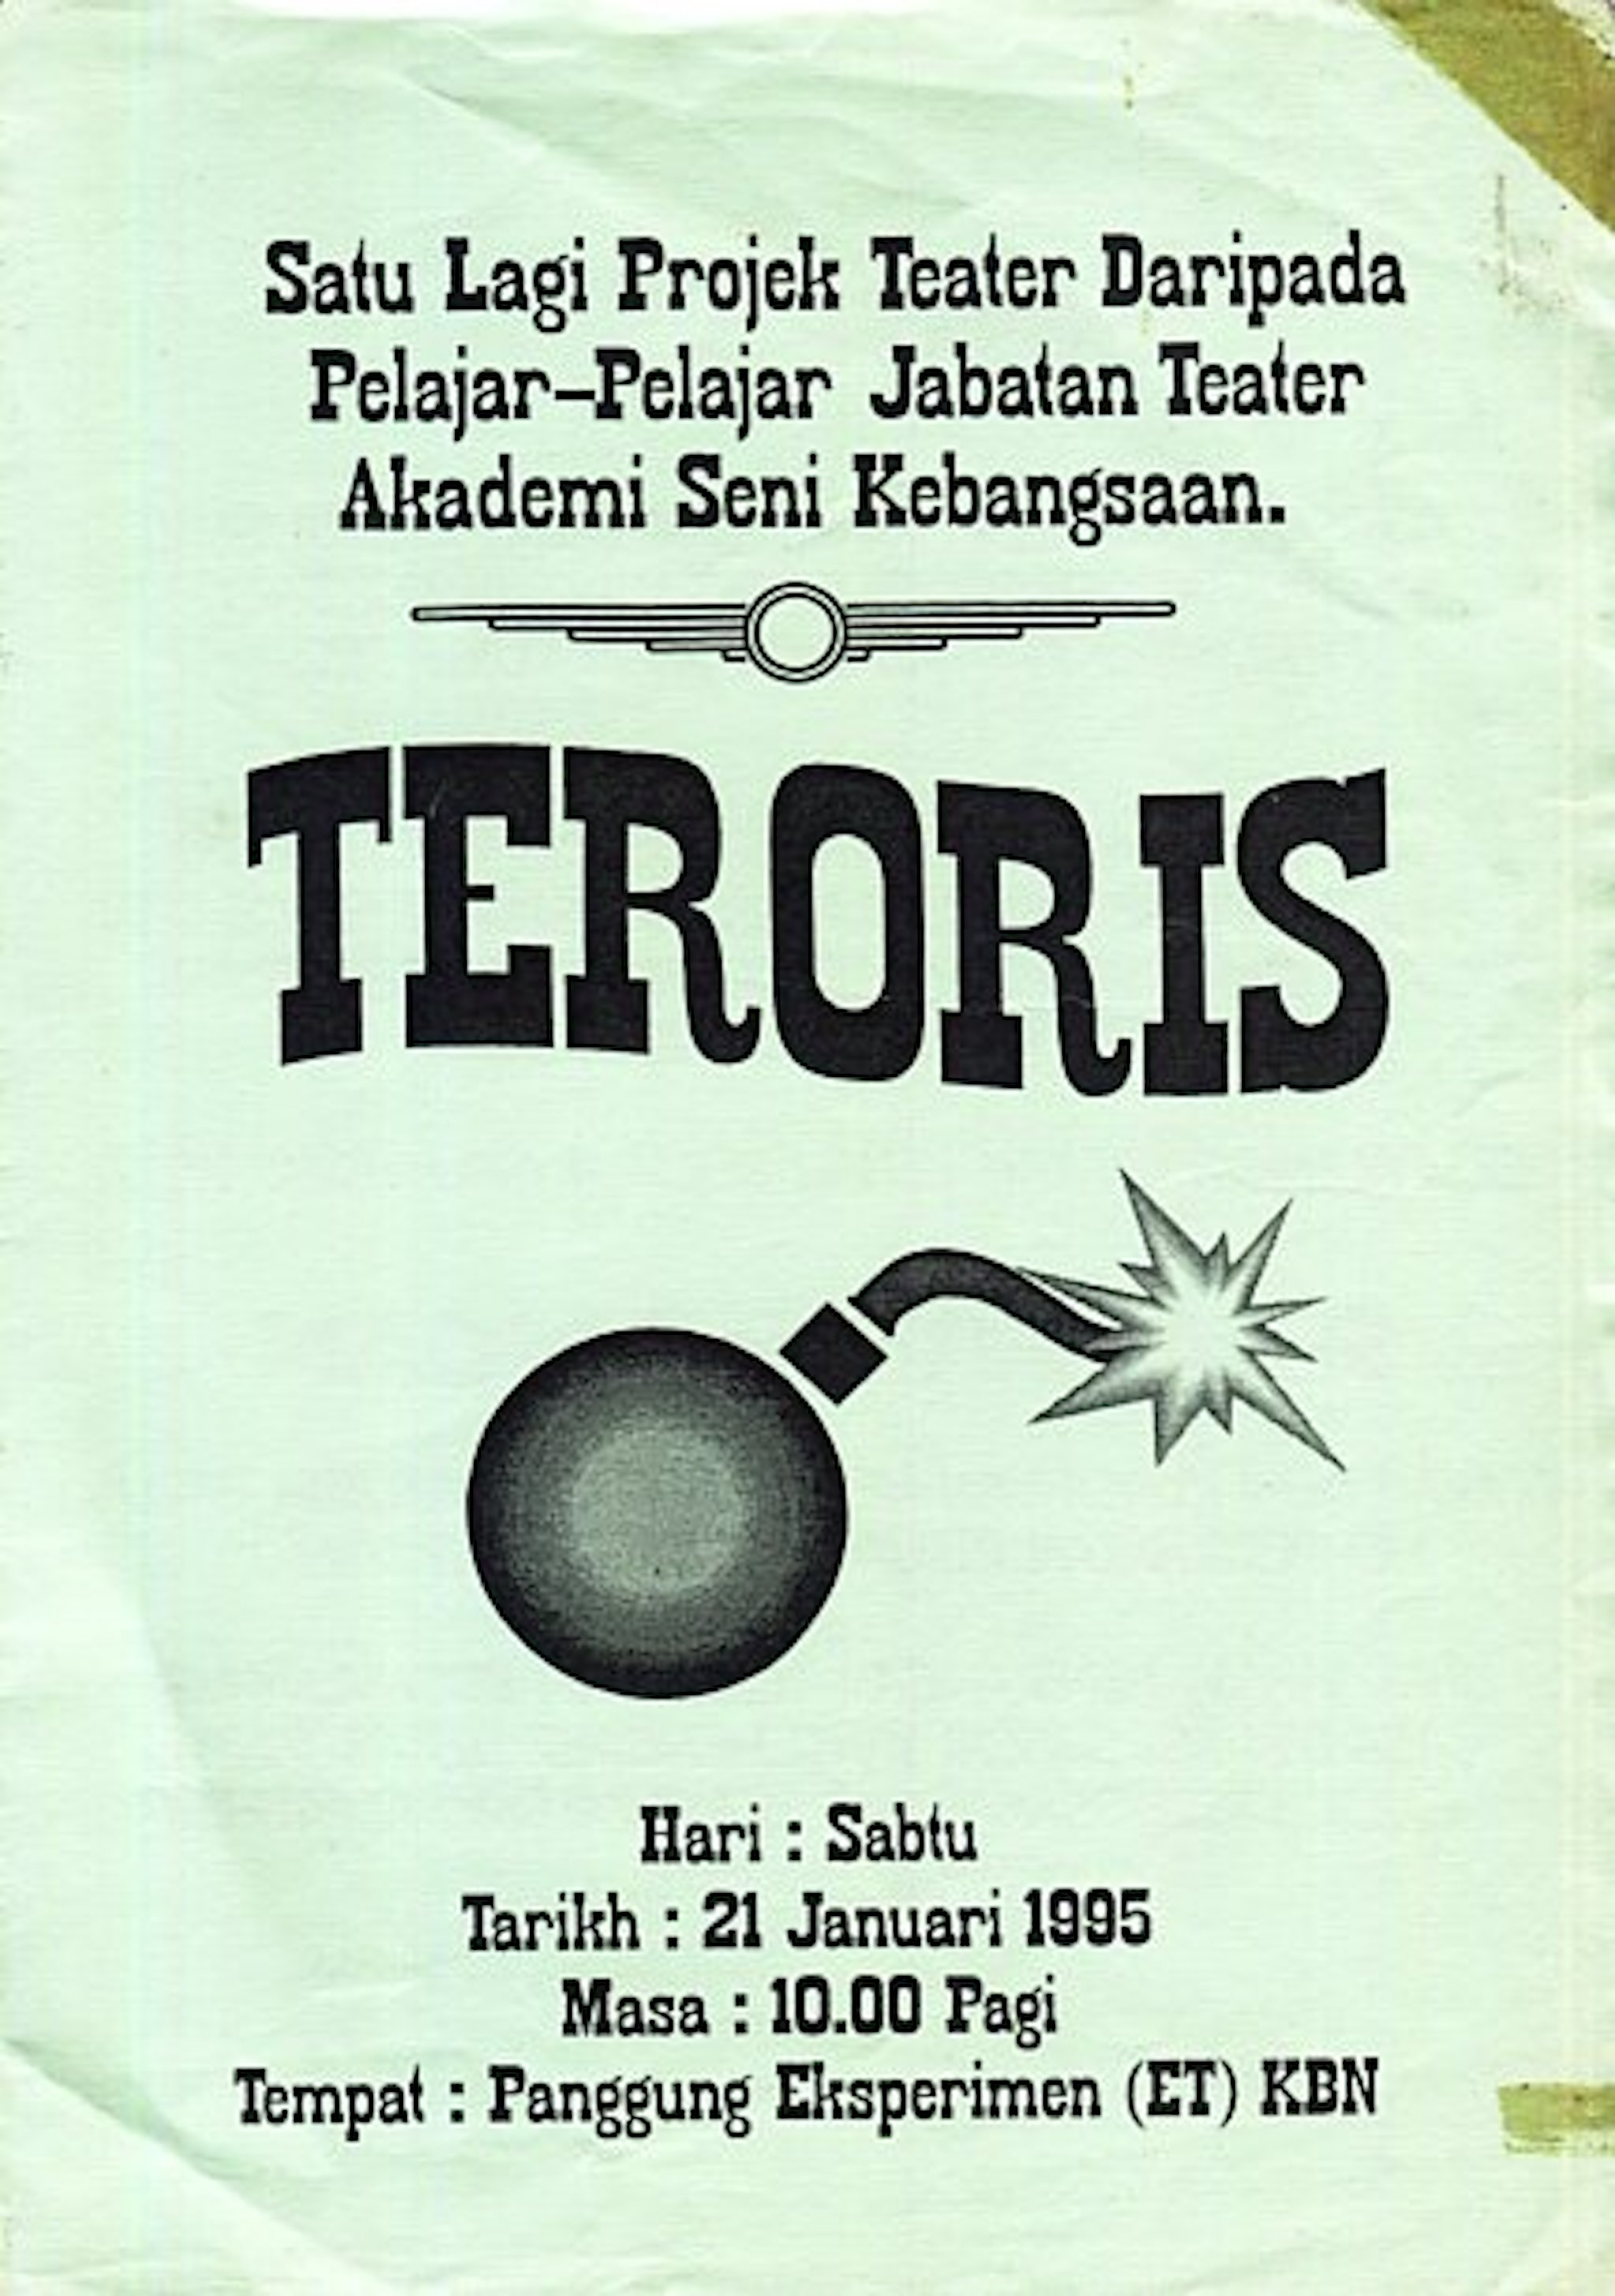 1995 Teroris cover